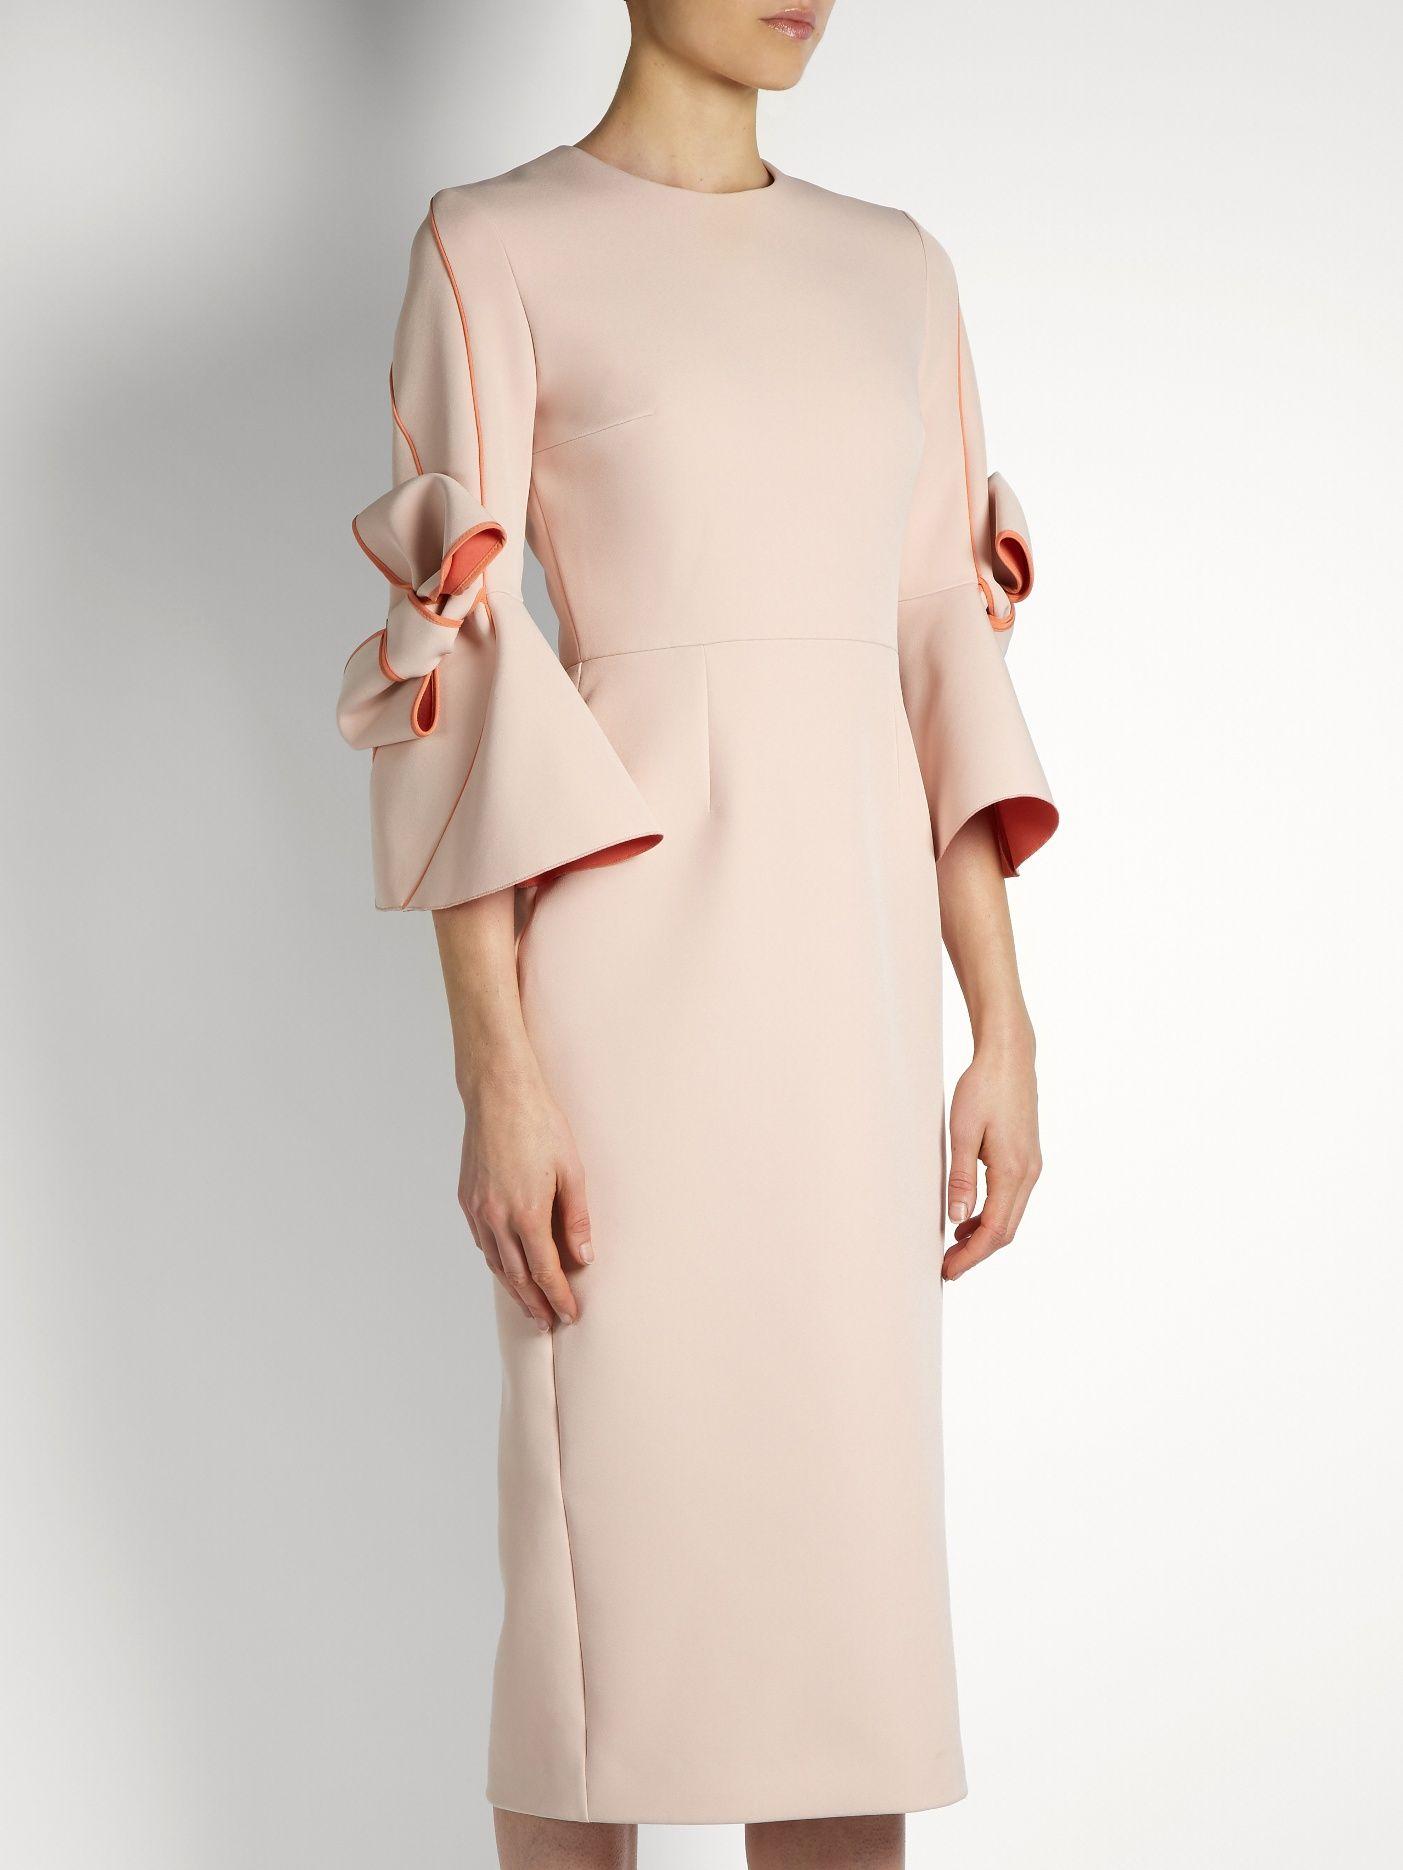 Buy Cheap Shop For 2018 New Online Lavete crêpe dress Roksanda Ilincic Hyper Online Buy Cheap 100% Guaranteed q899nbPuQh